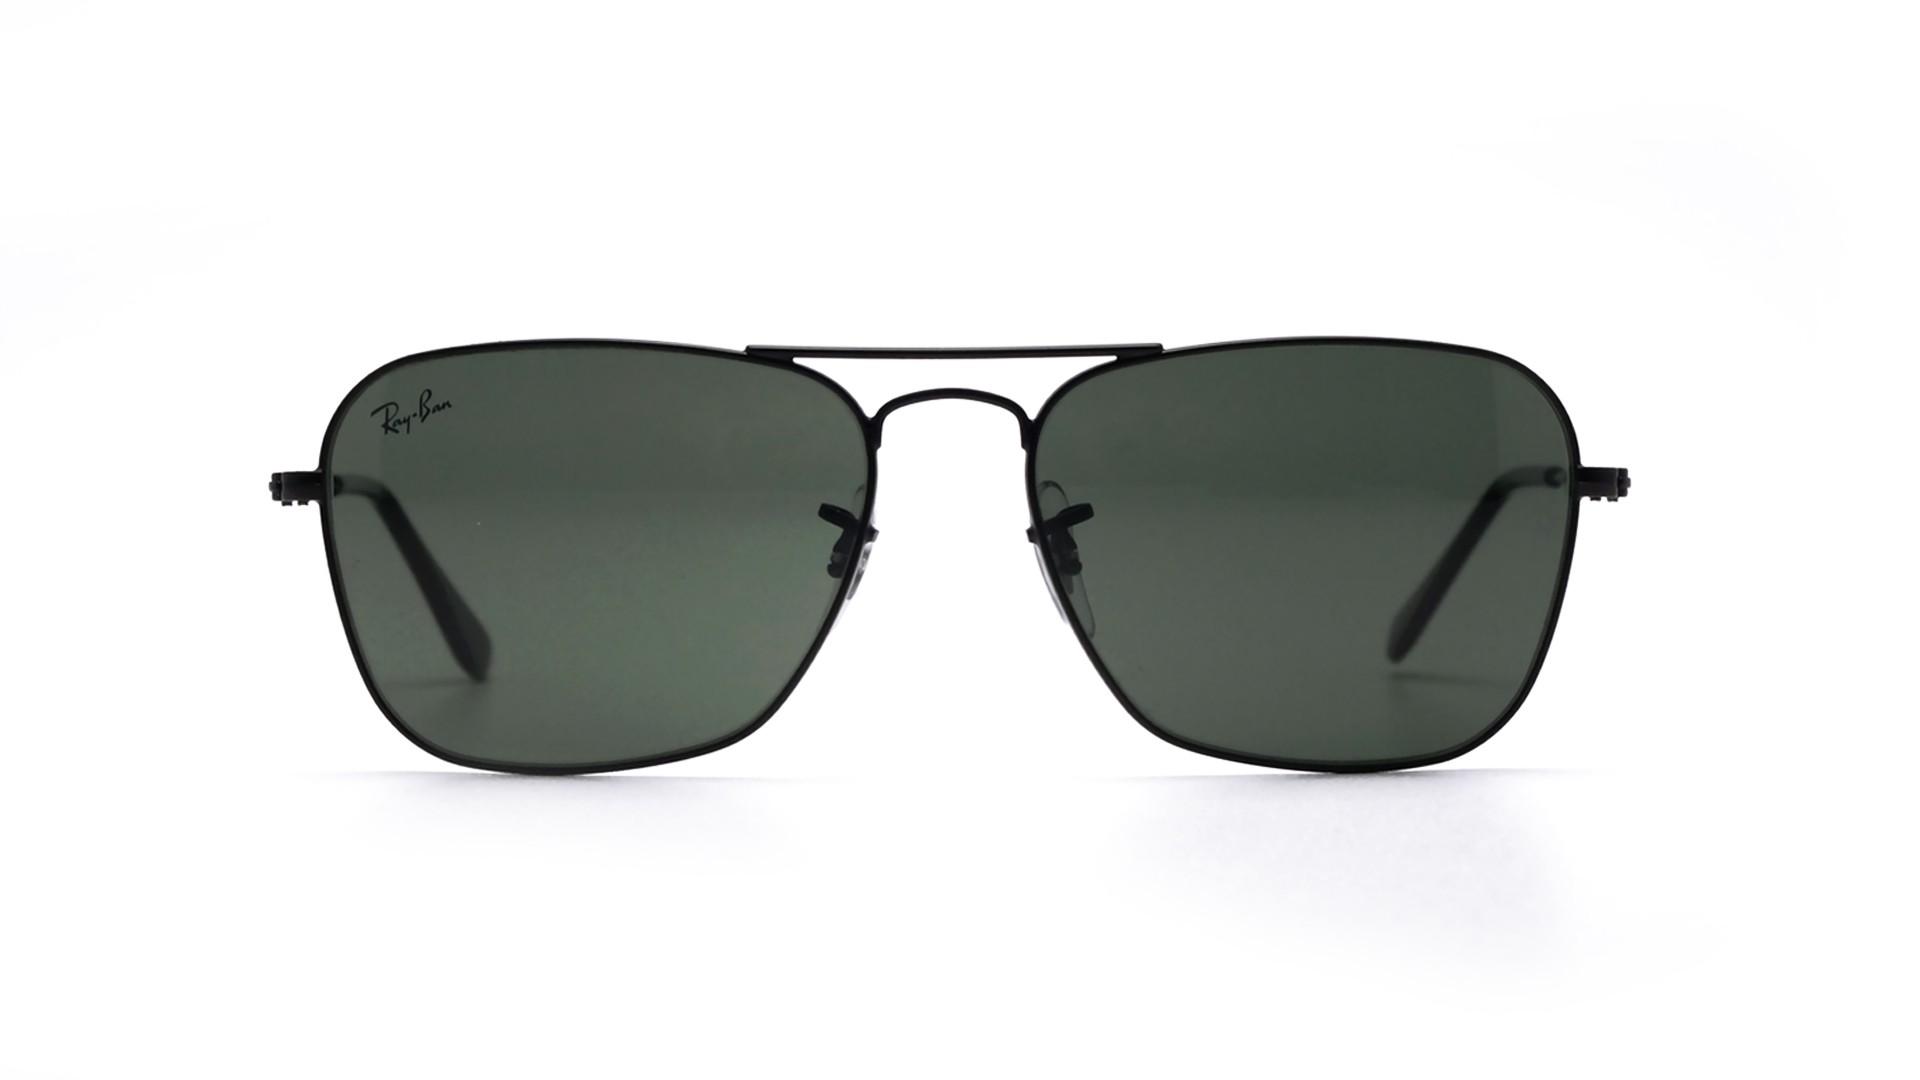 ae865ad41e Sunglasses Ray-Ban Caravan Black Matte G-15 RB3136 W3338 55-15 Medium